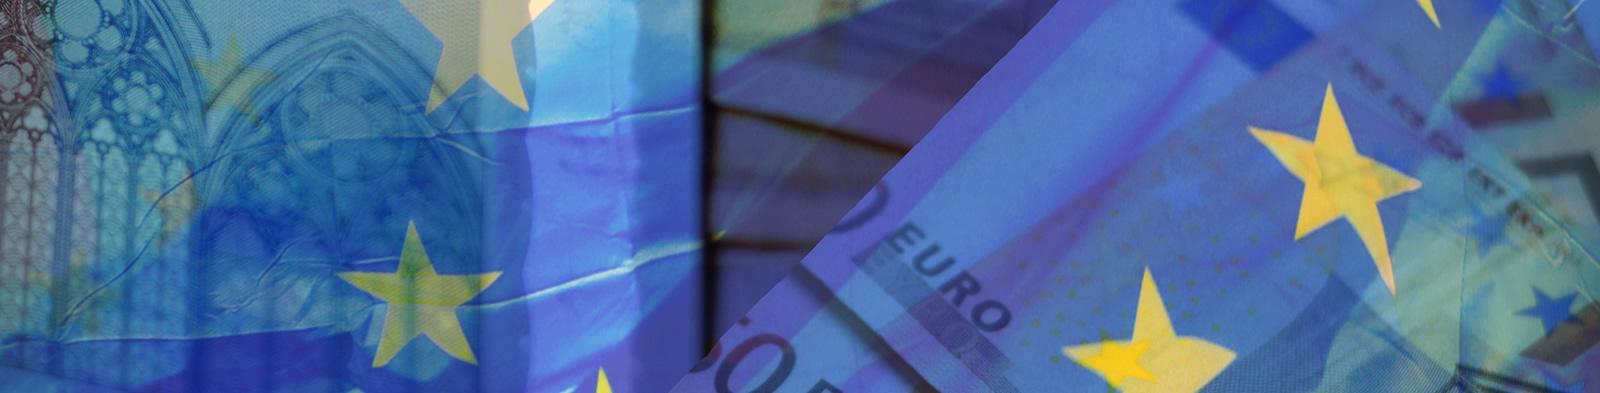 European flag and bank notes